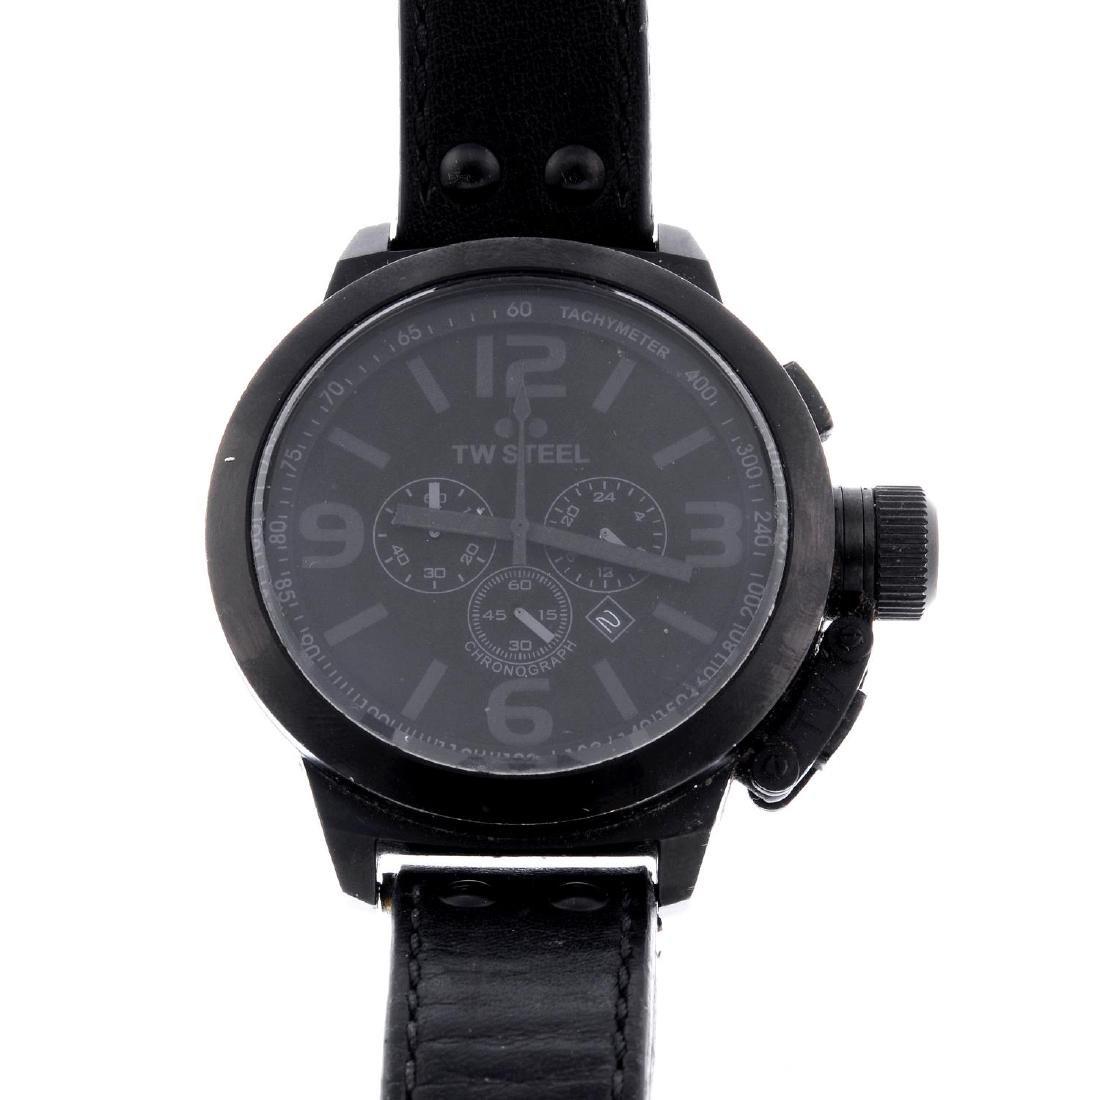 TW STEEL - a gentleman's chronograph wrist watch.